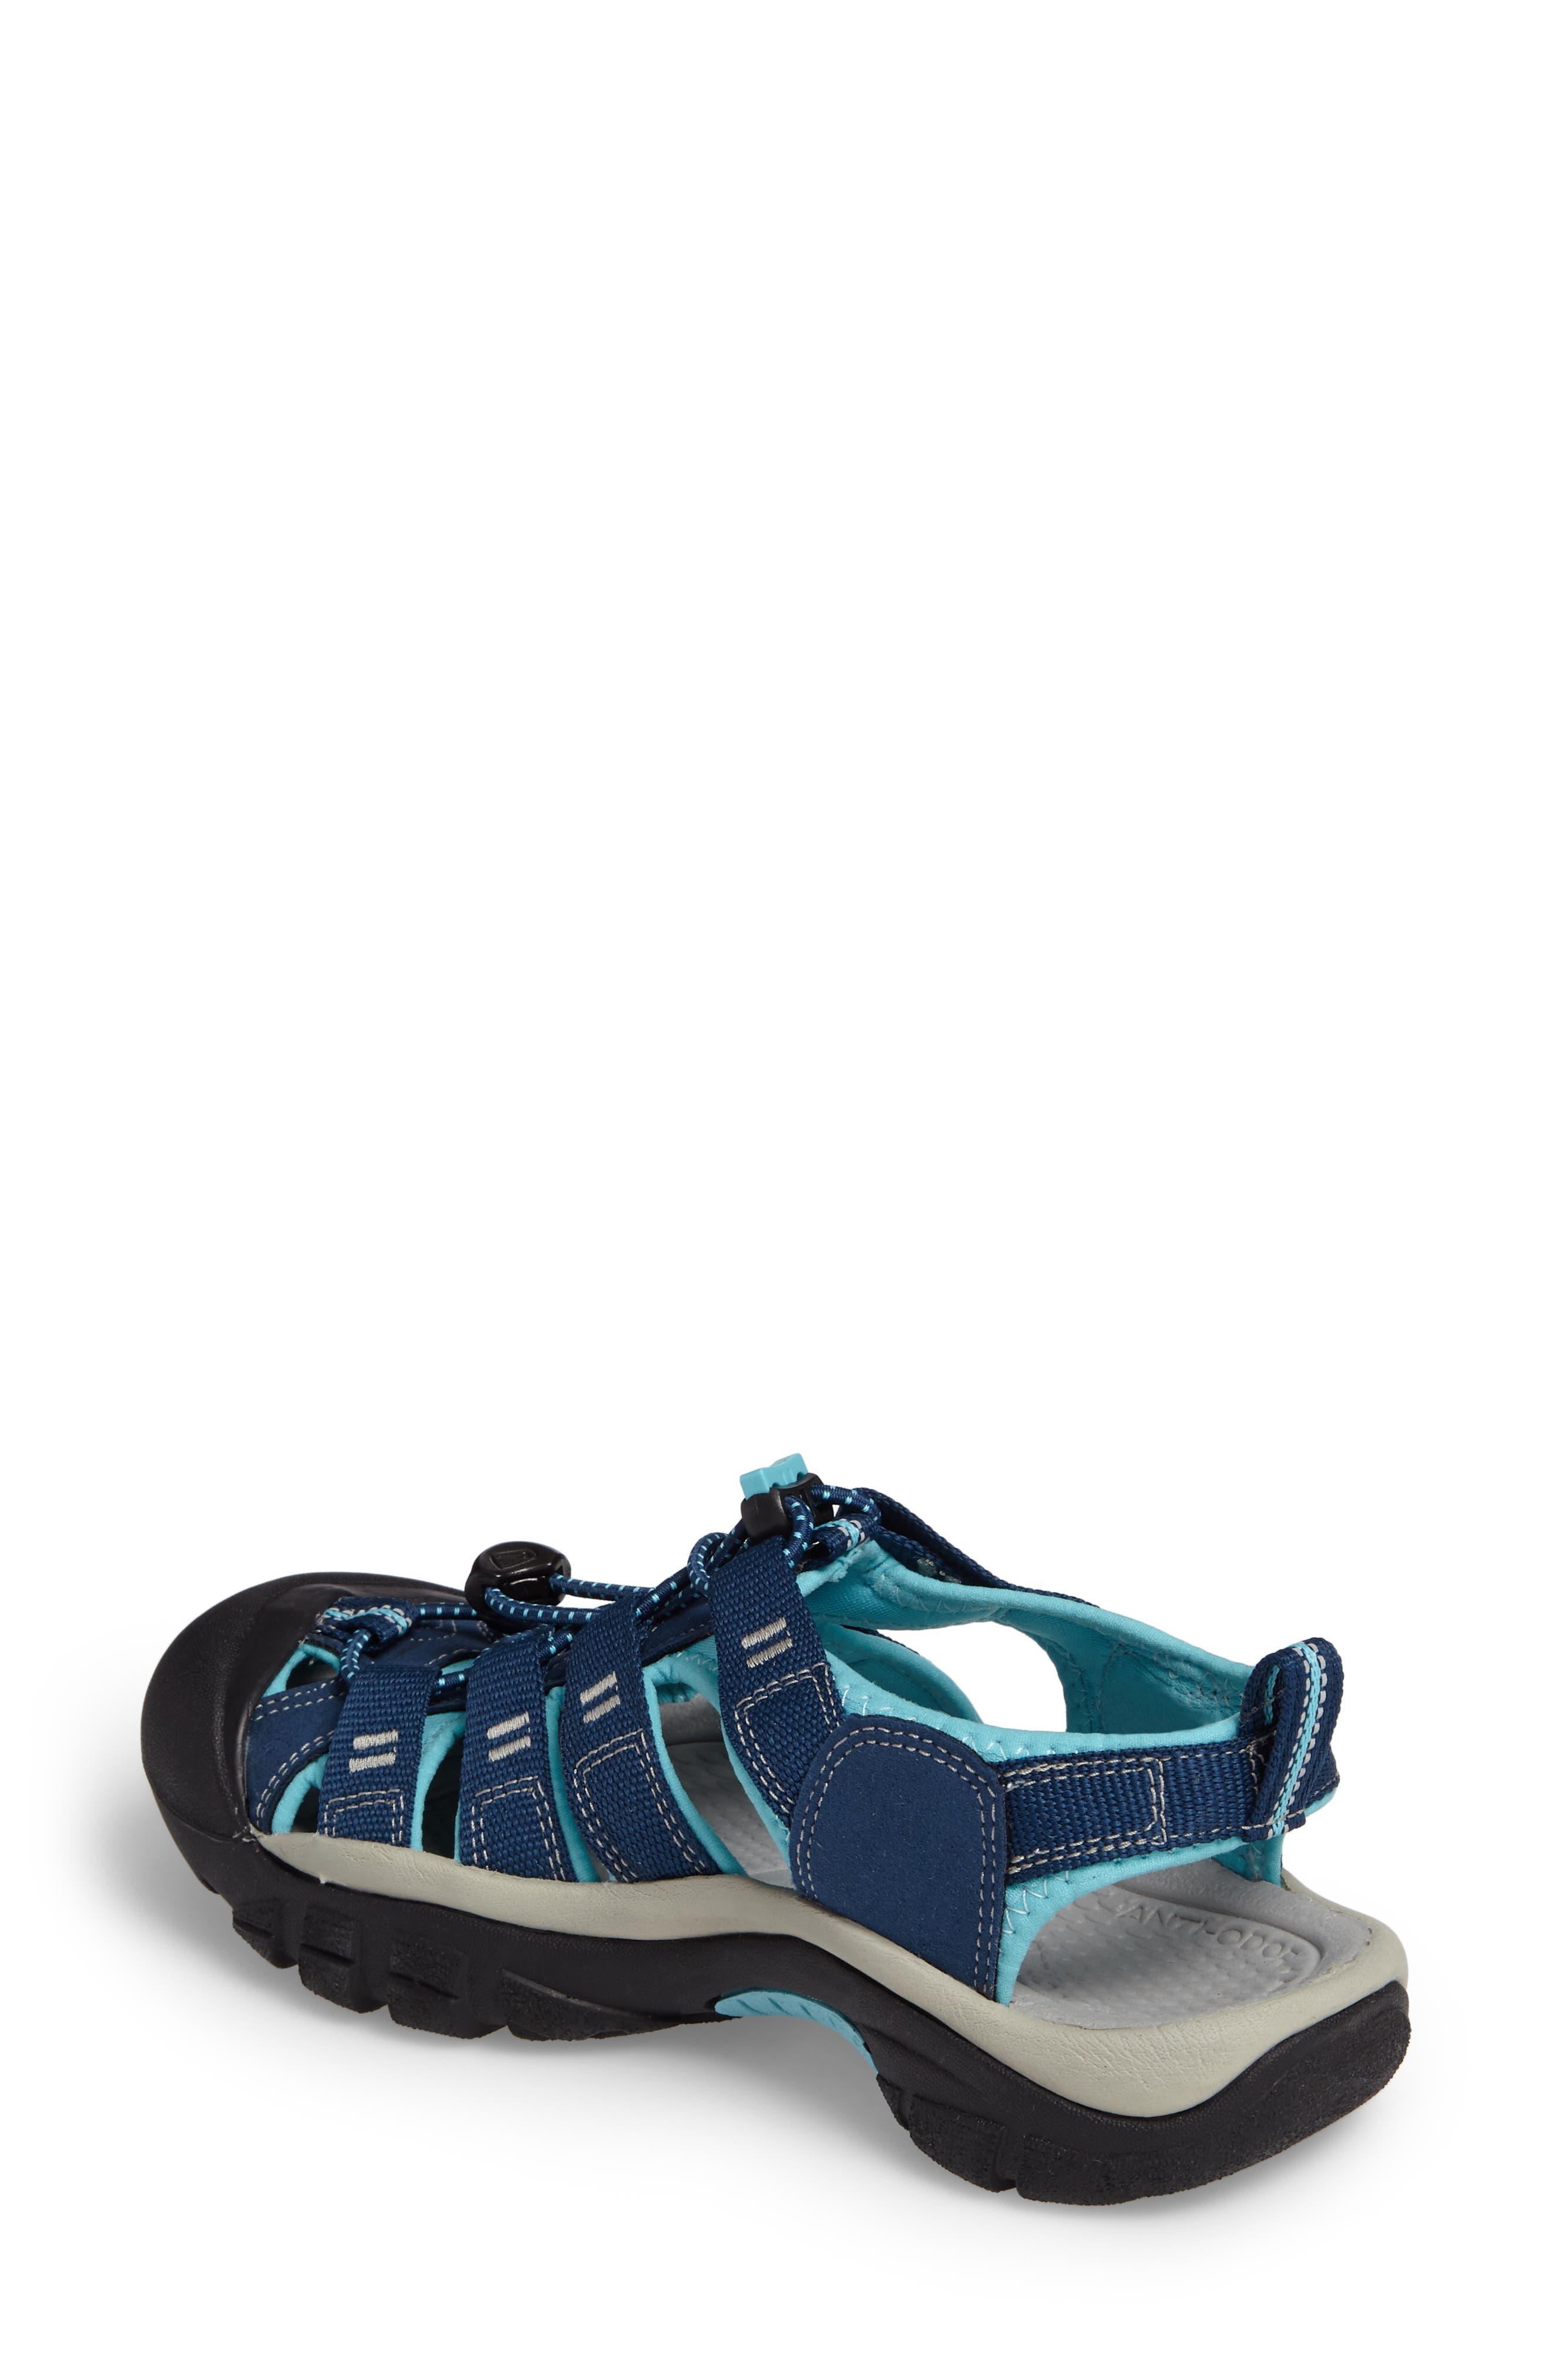 Alternate Image 2  - Keen 'Newport H2' Sandal (Women)